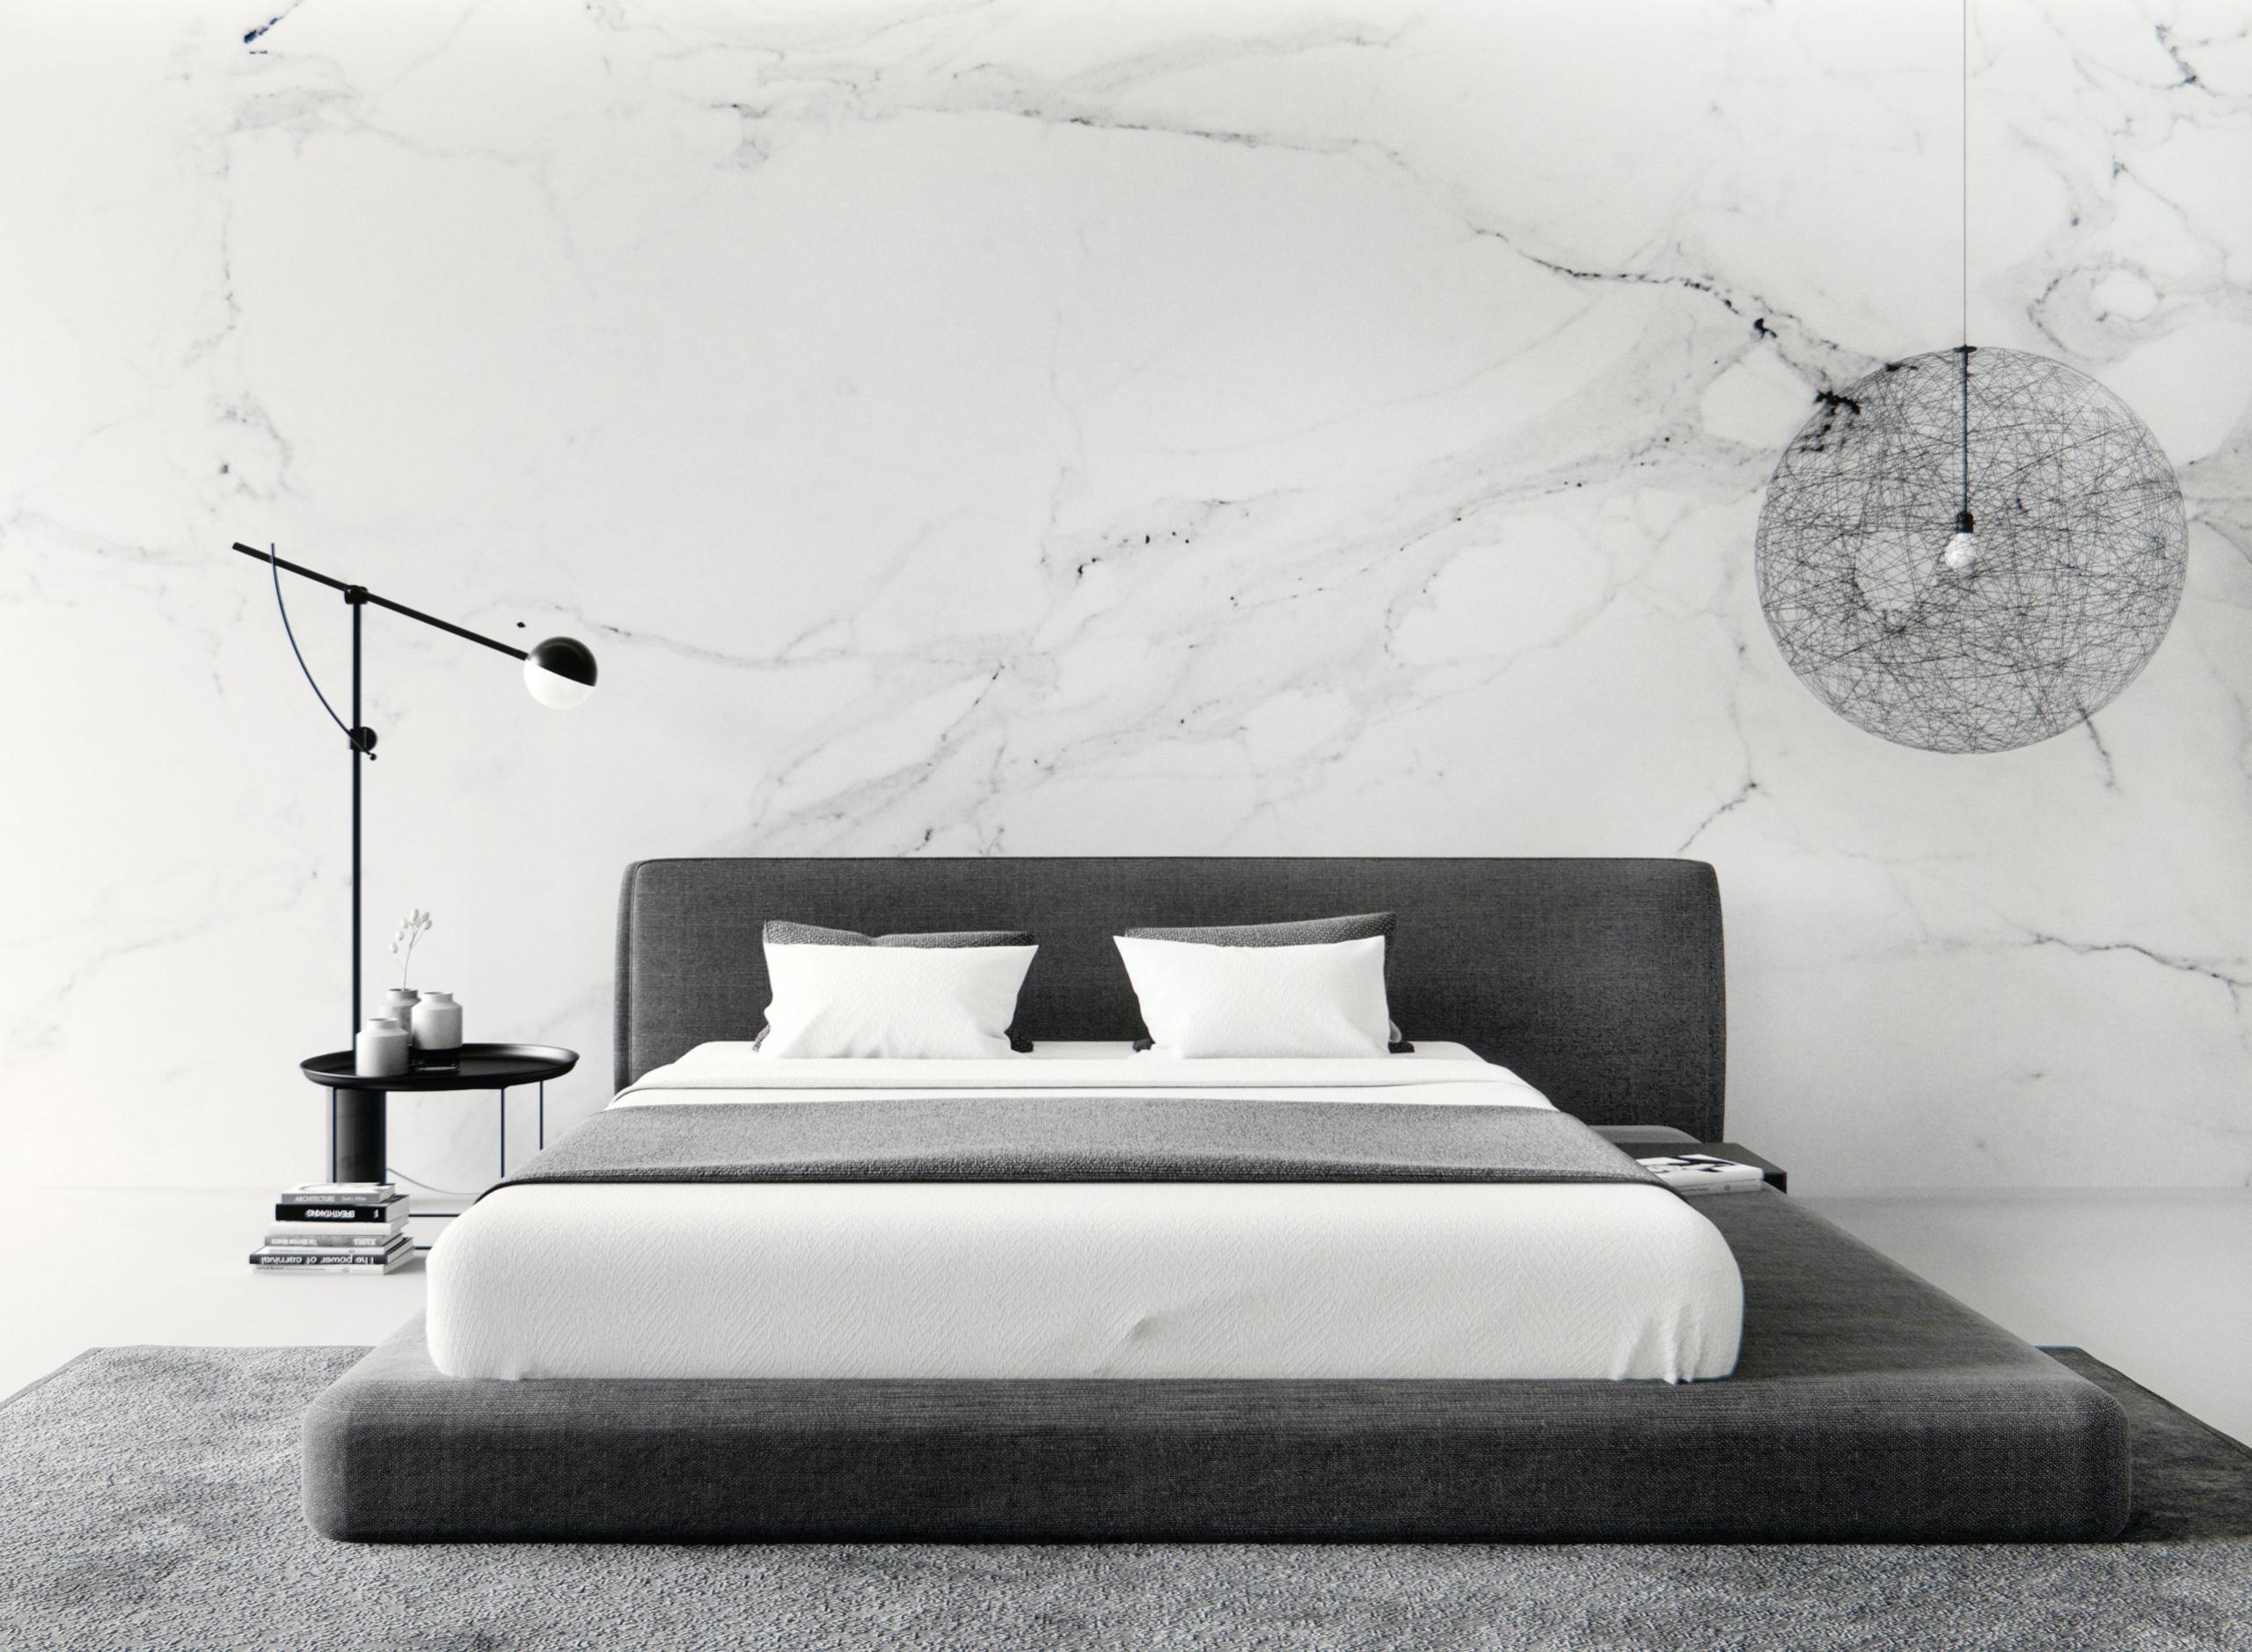 publish essays minimalism weekl - minimalism | ello